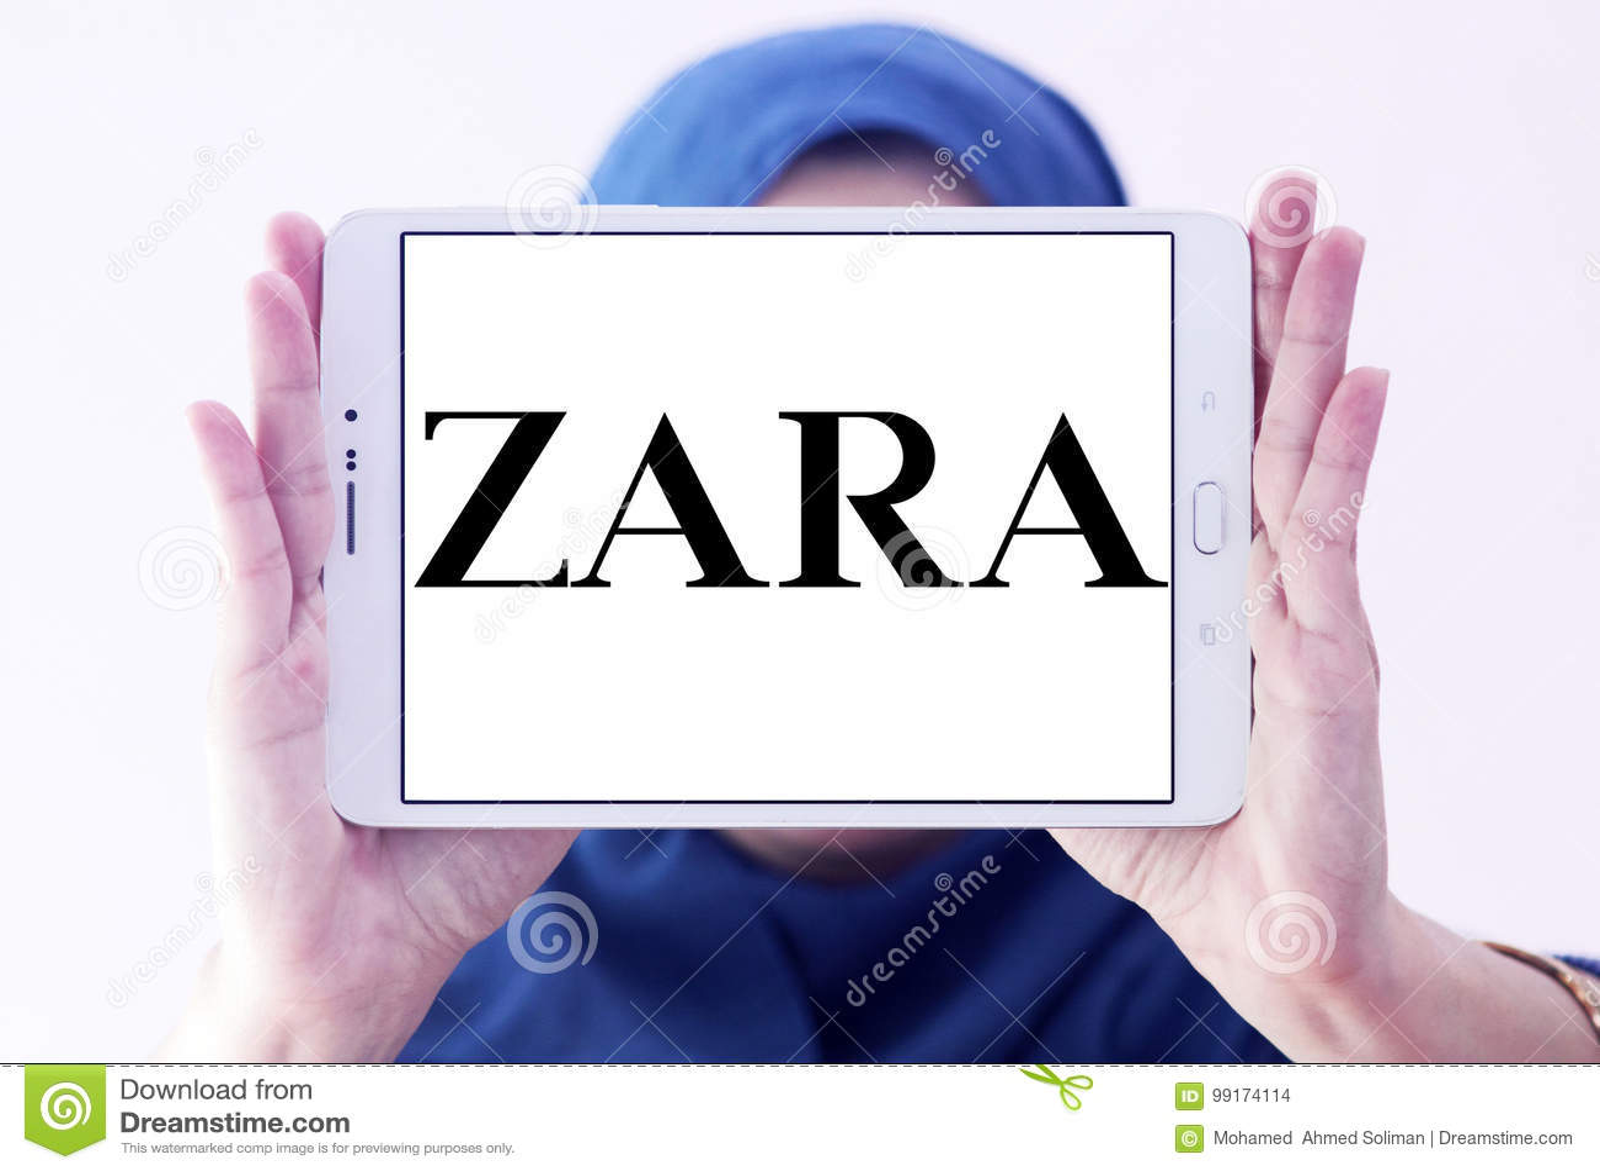 Zara Logo Editorial Stock Image Image Of Company Brand 99174114